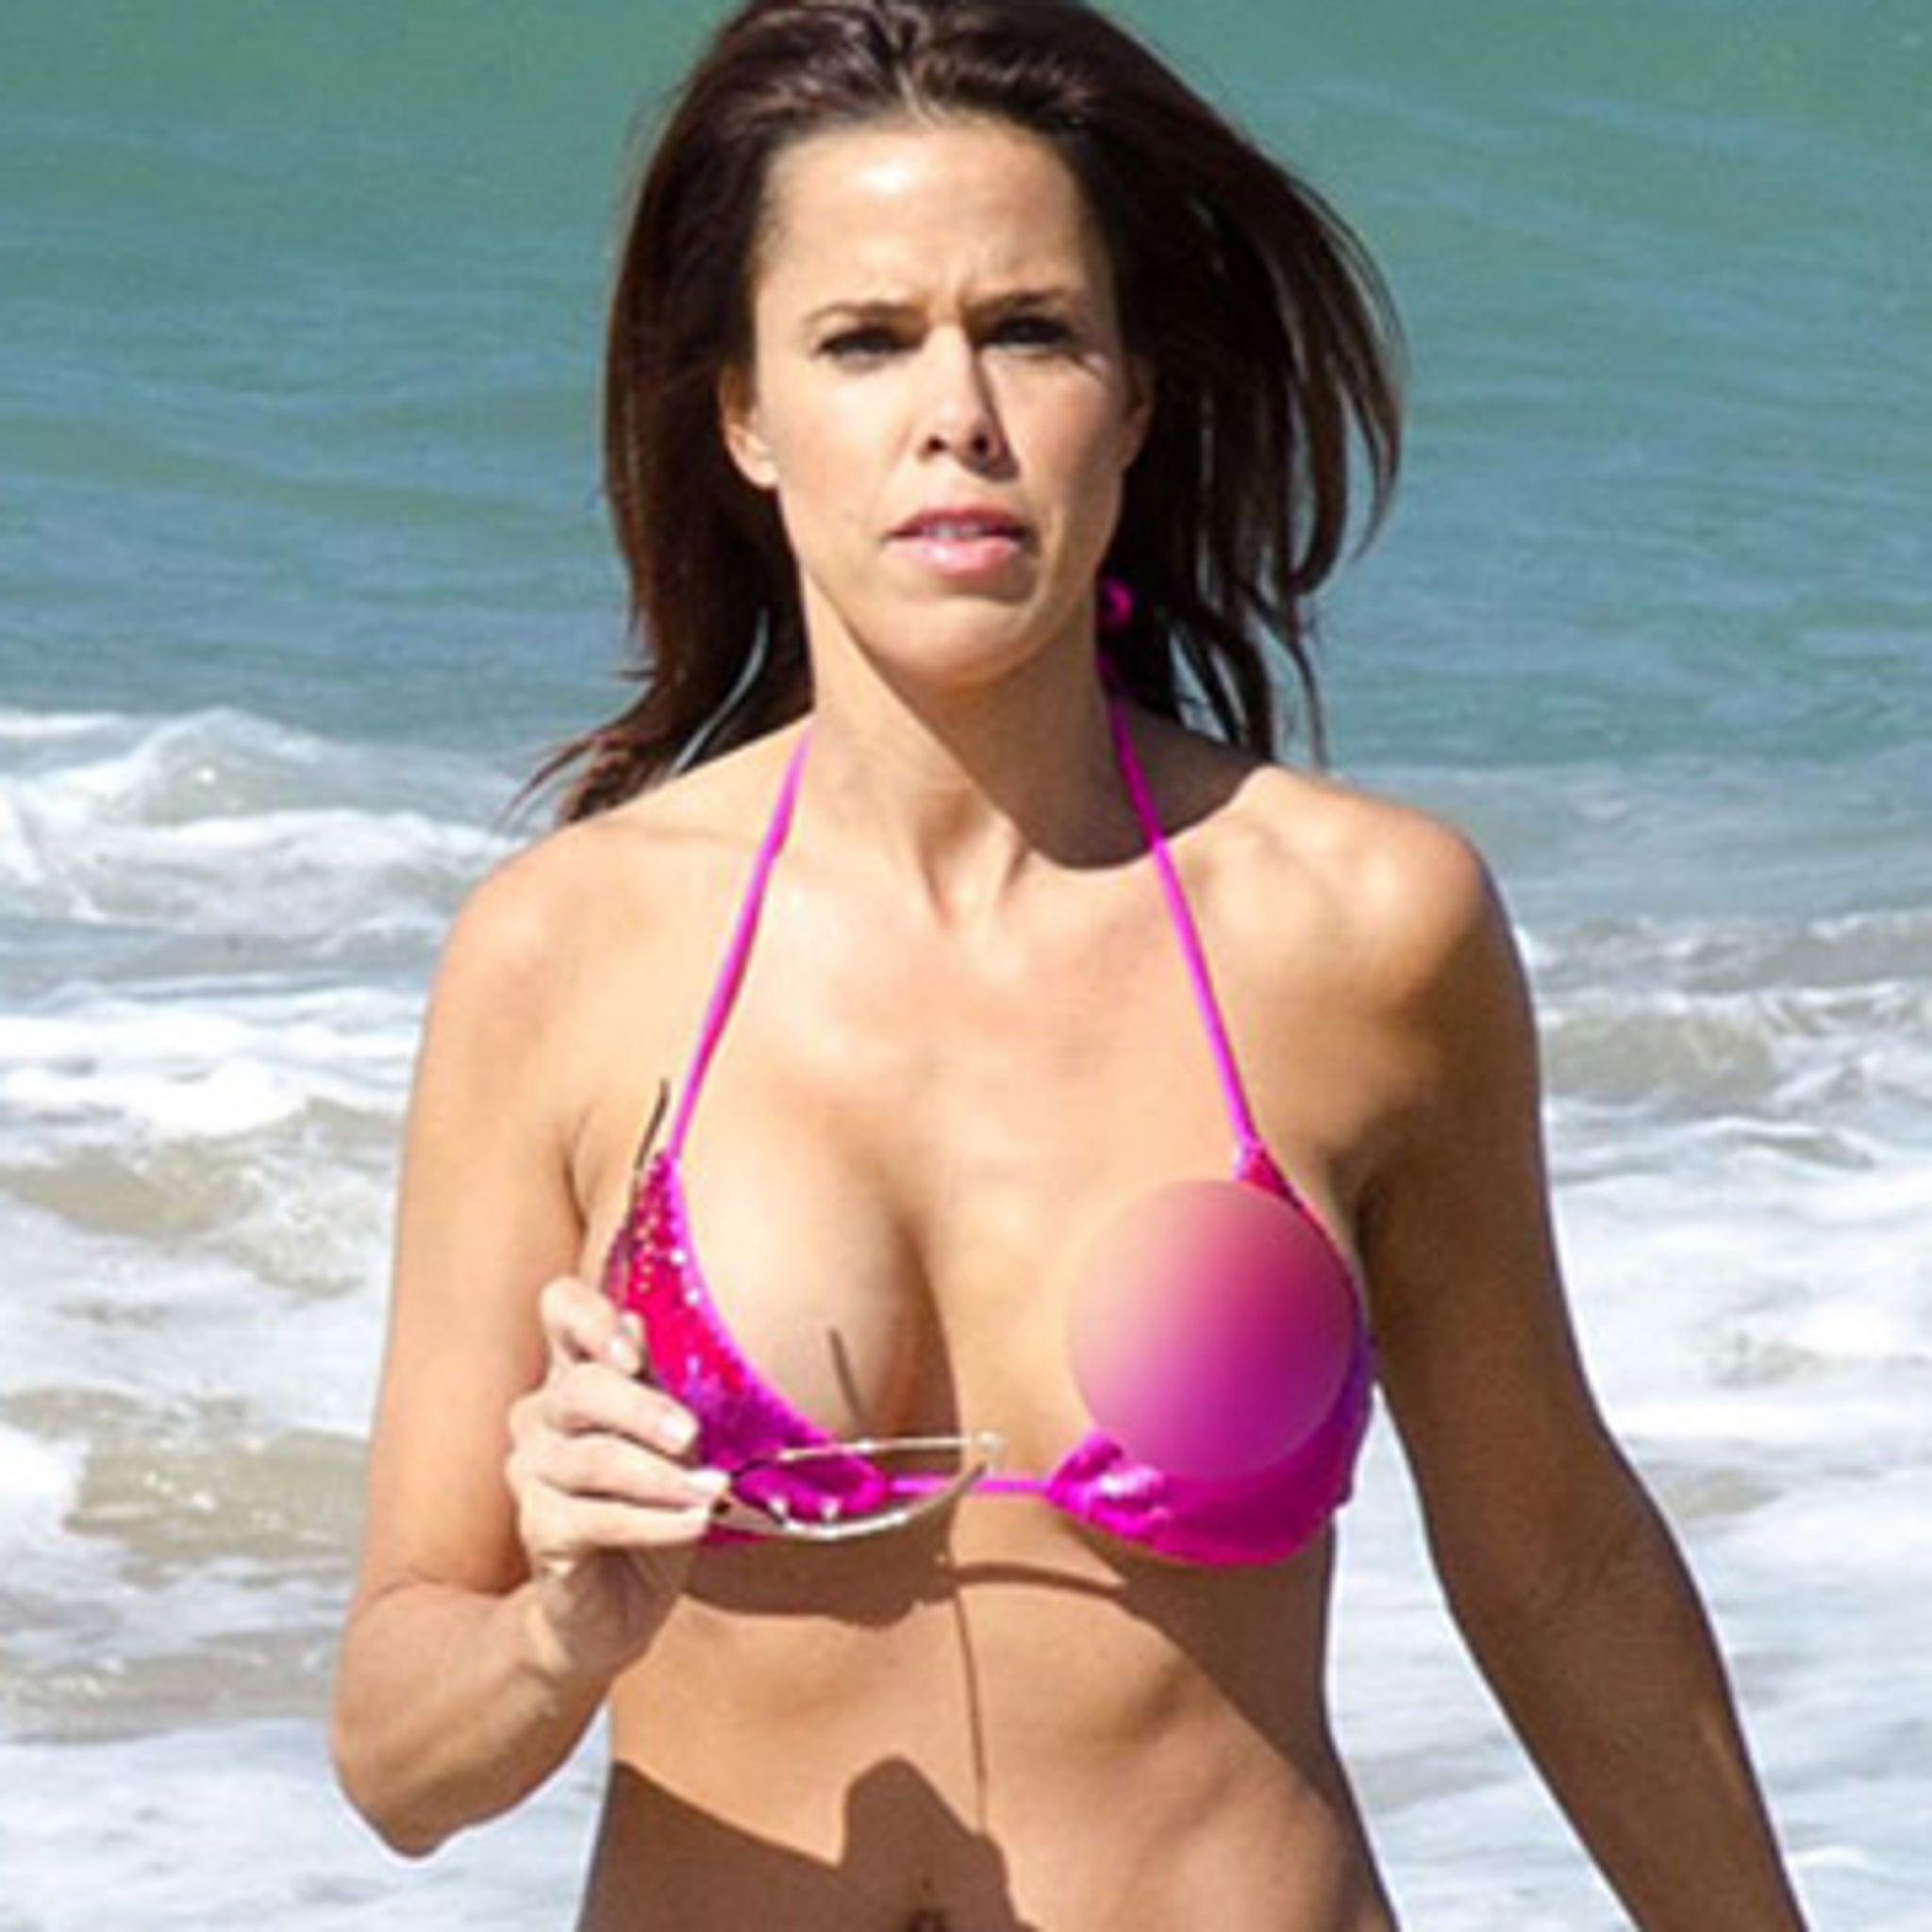 Fun 'family' Bikini For Whole Pics The Rosa Blasi u351JcTlFK